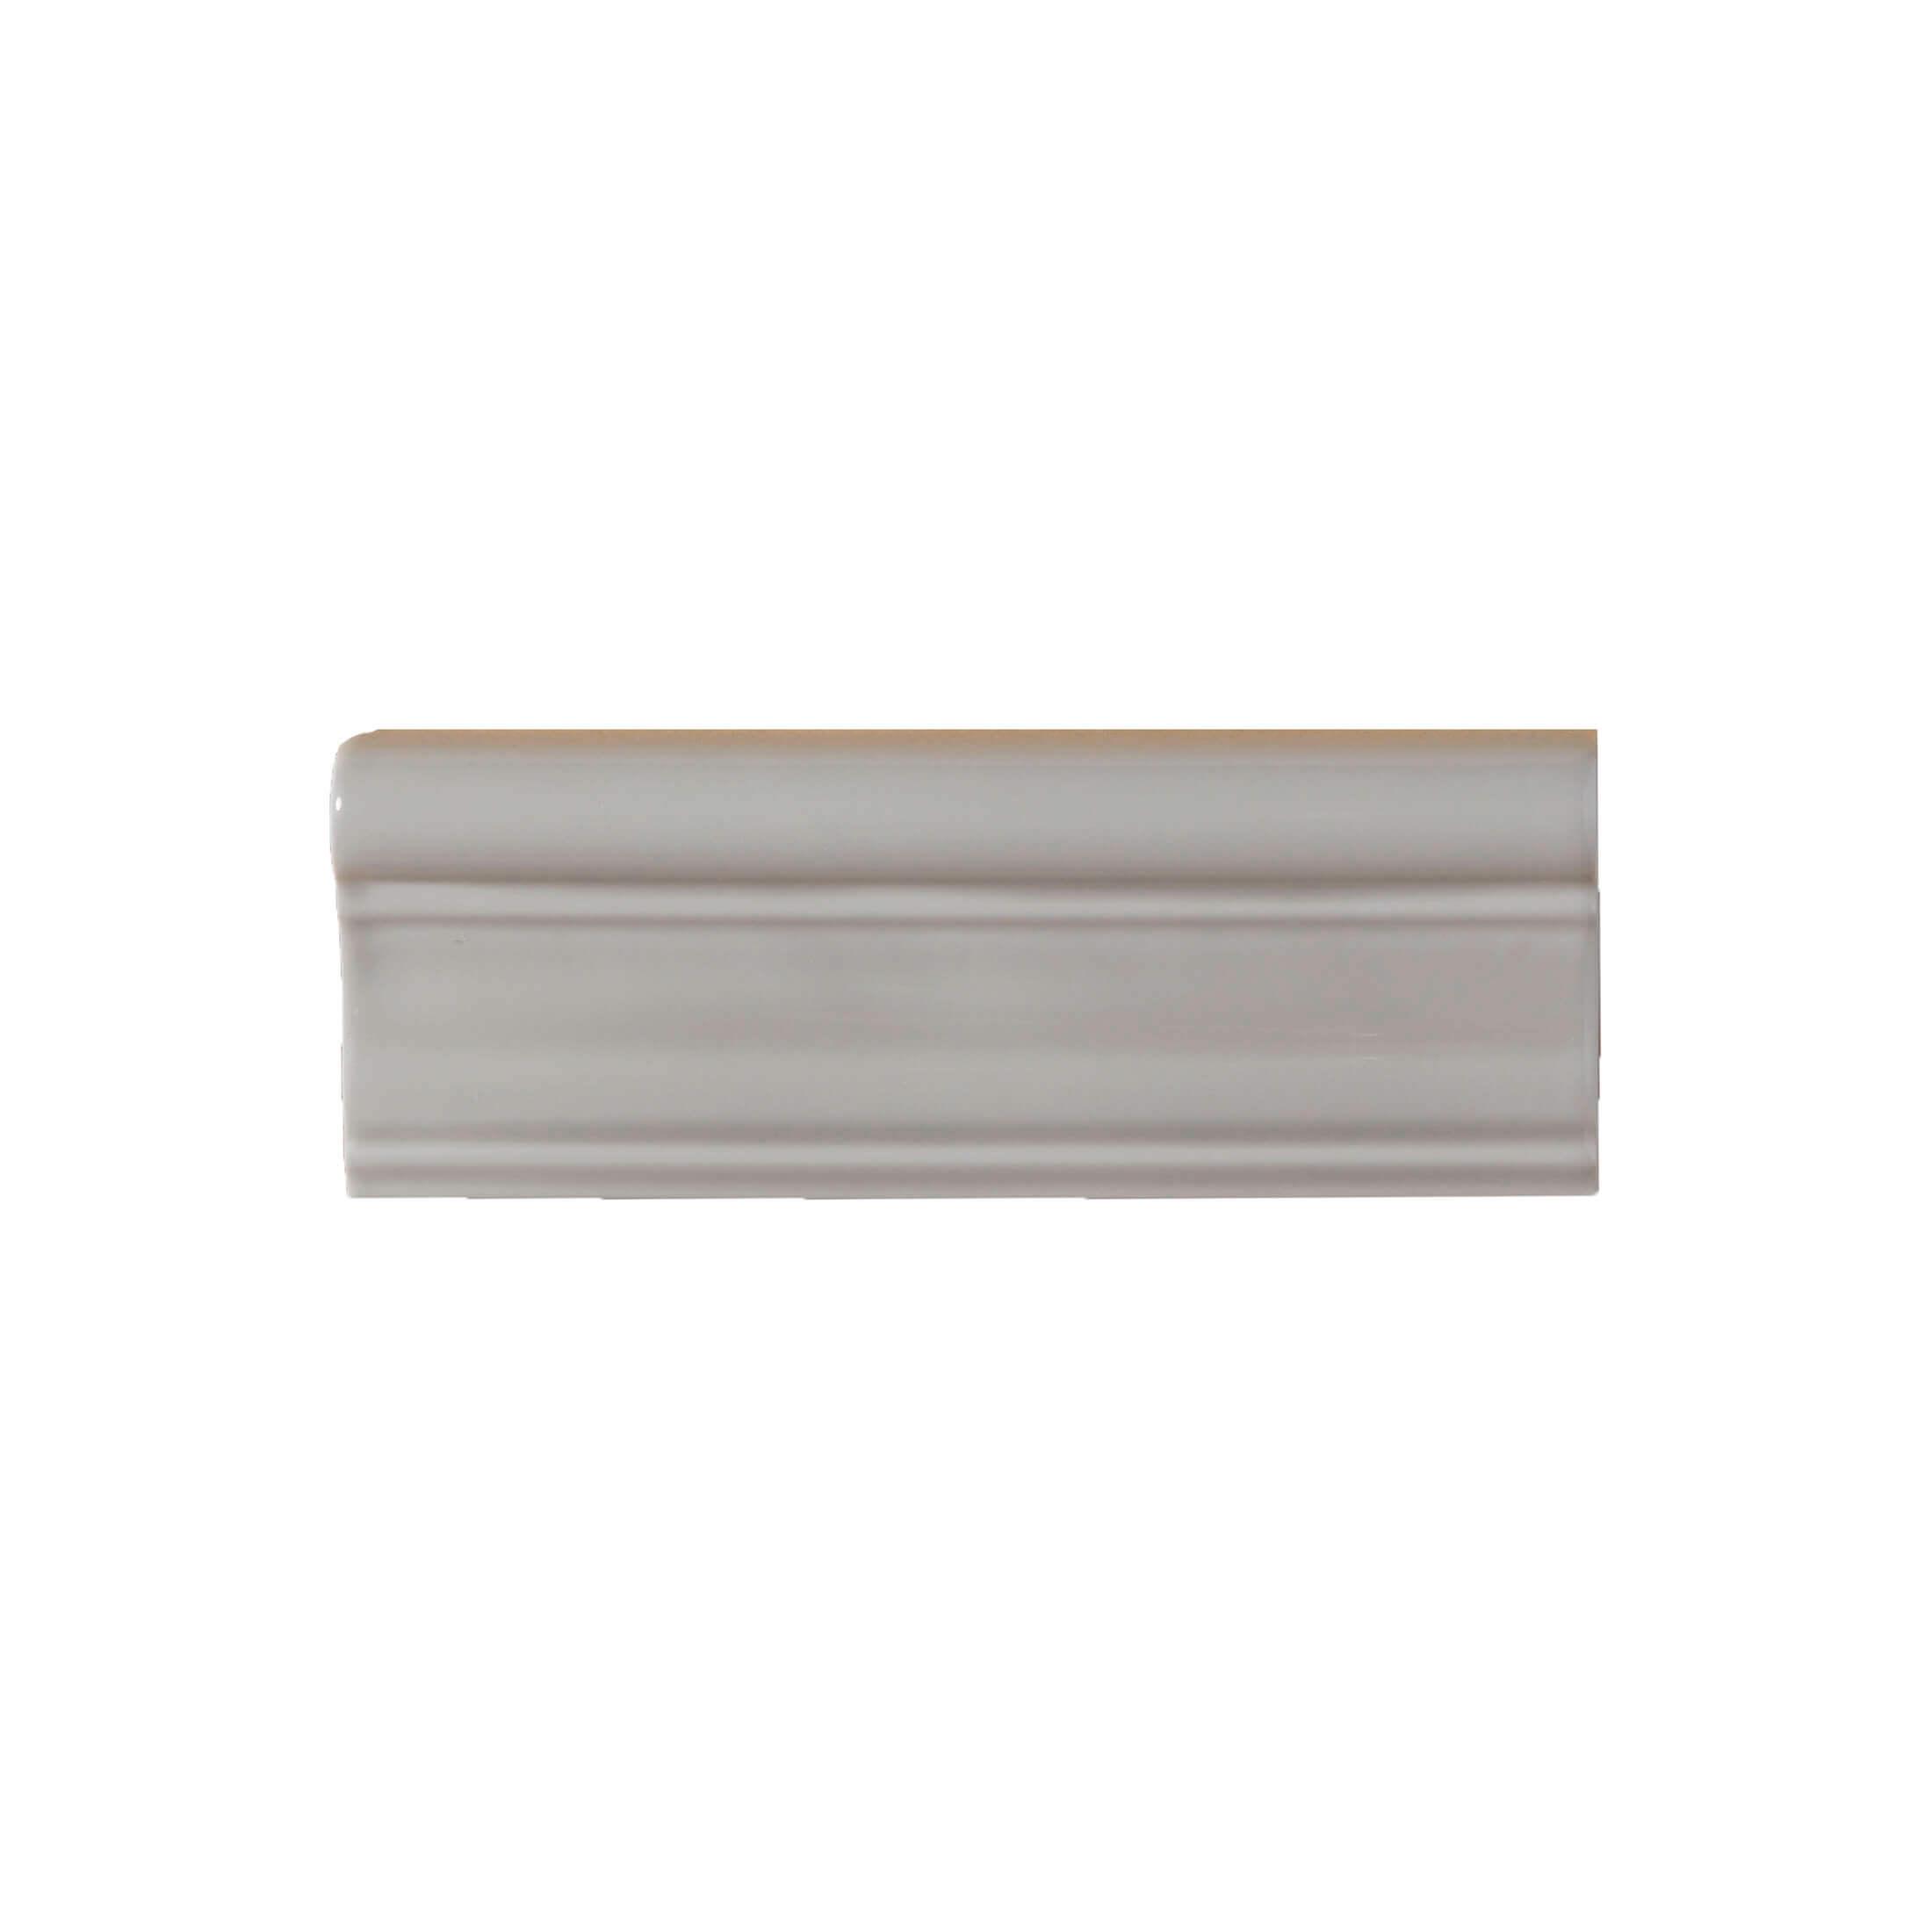 ADST5099 - CORNISA  - 7.5 cm X 19.8 cm